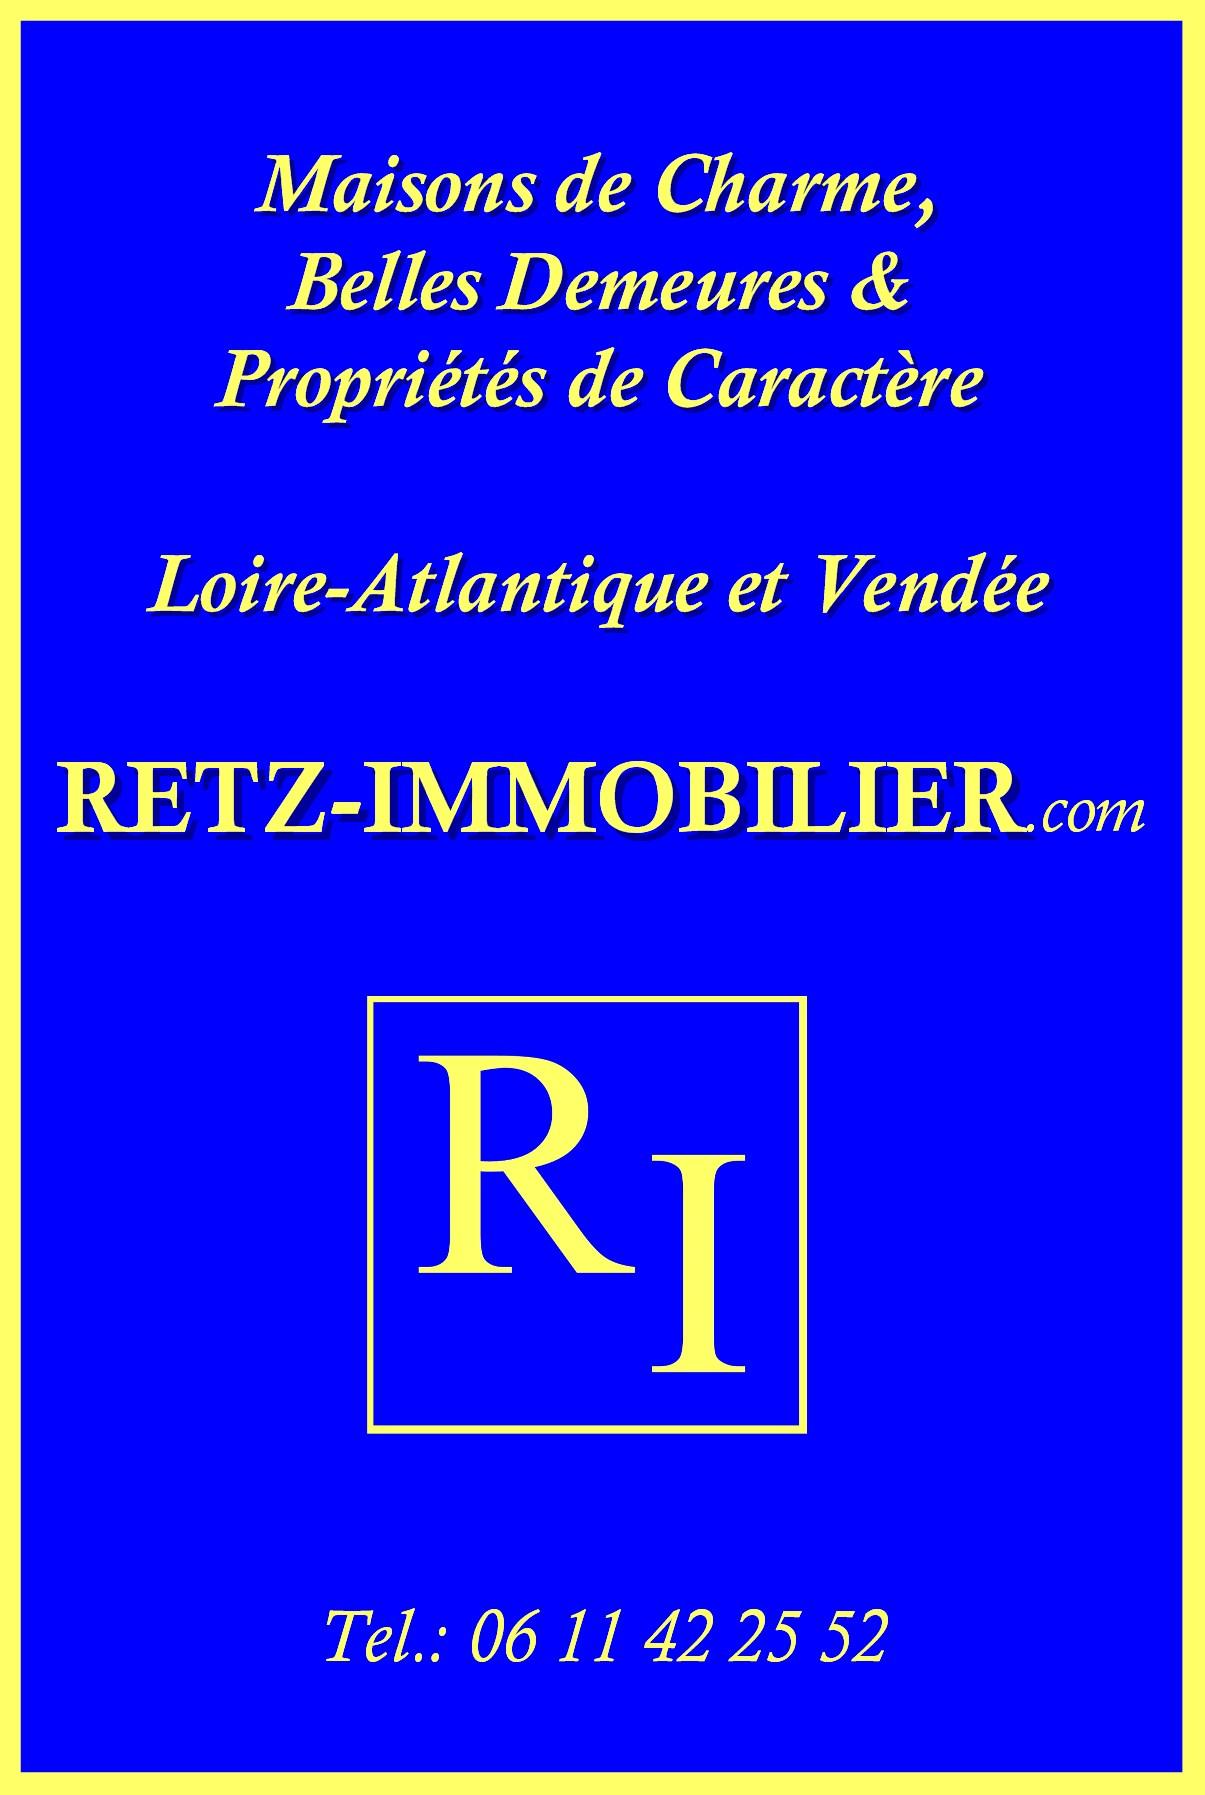 RETZ-IMMOBILIER